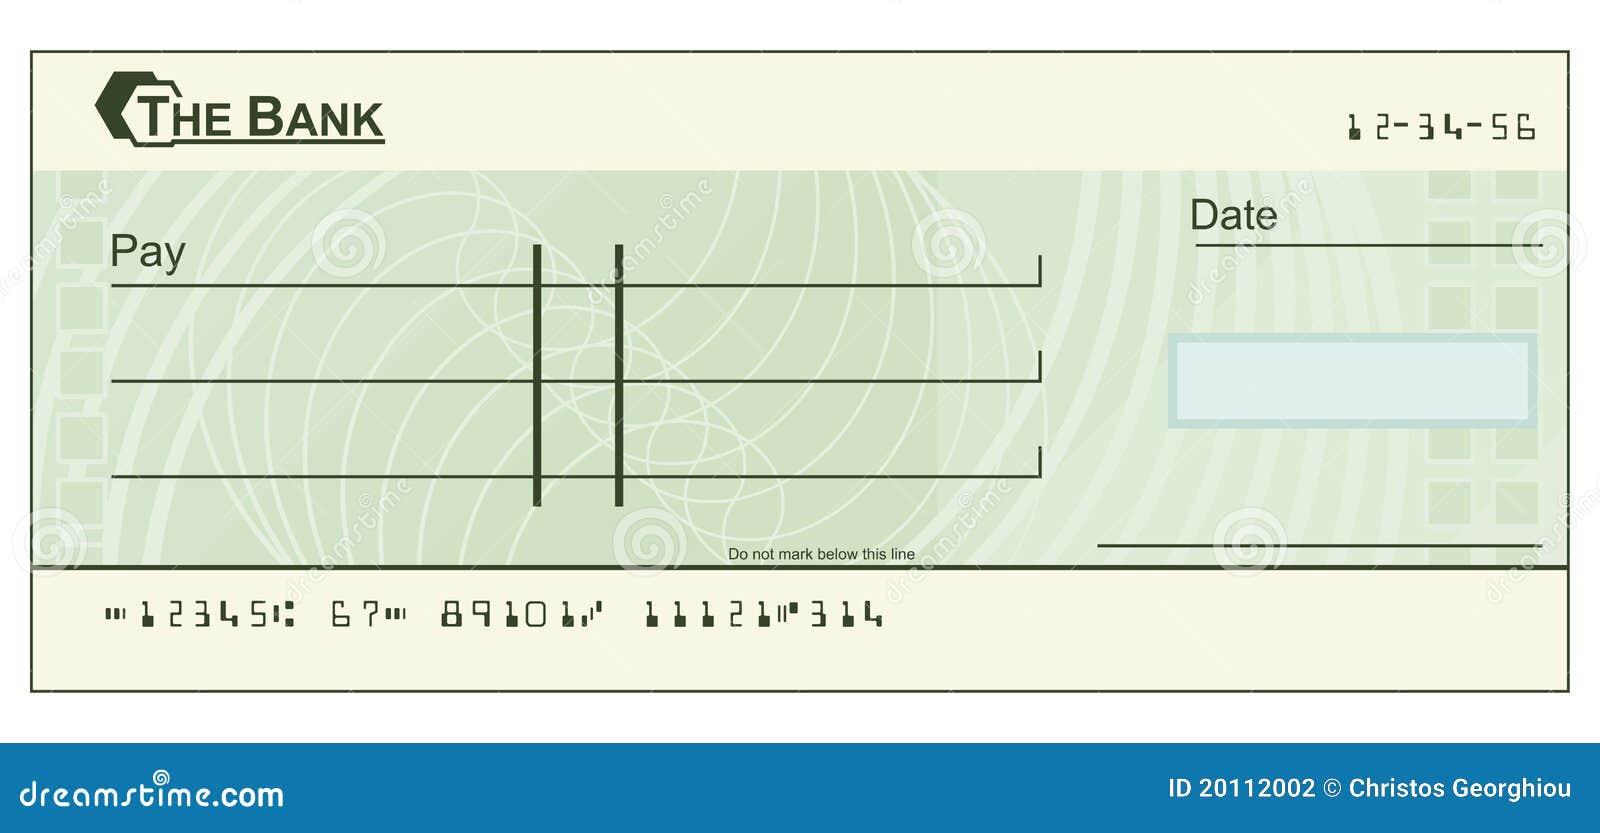 100+ Chime Banking Check Templates – yasminroohi